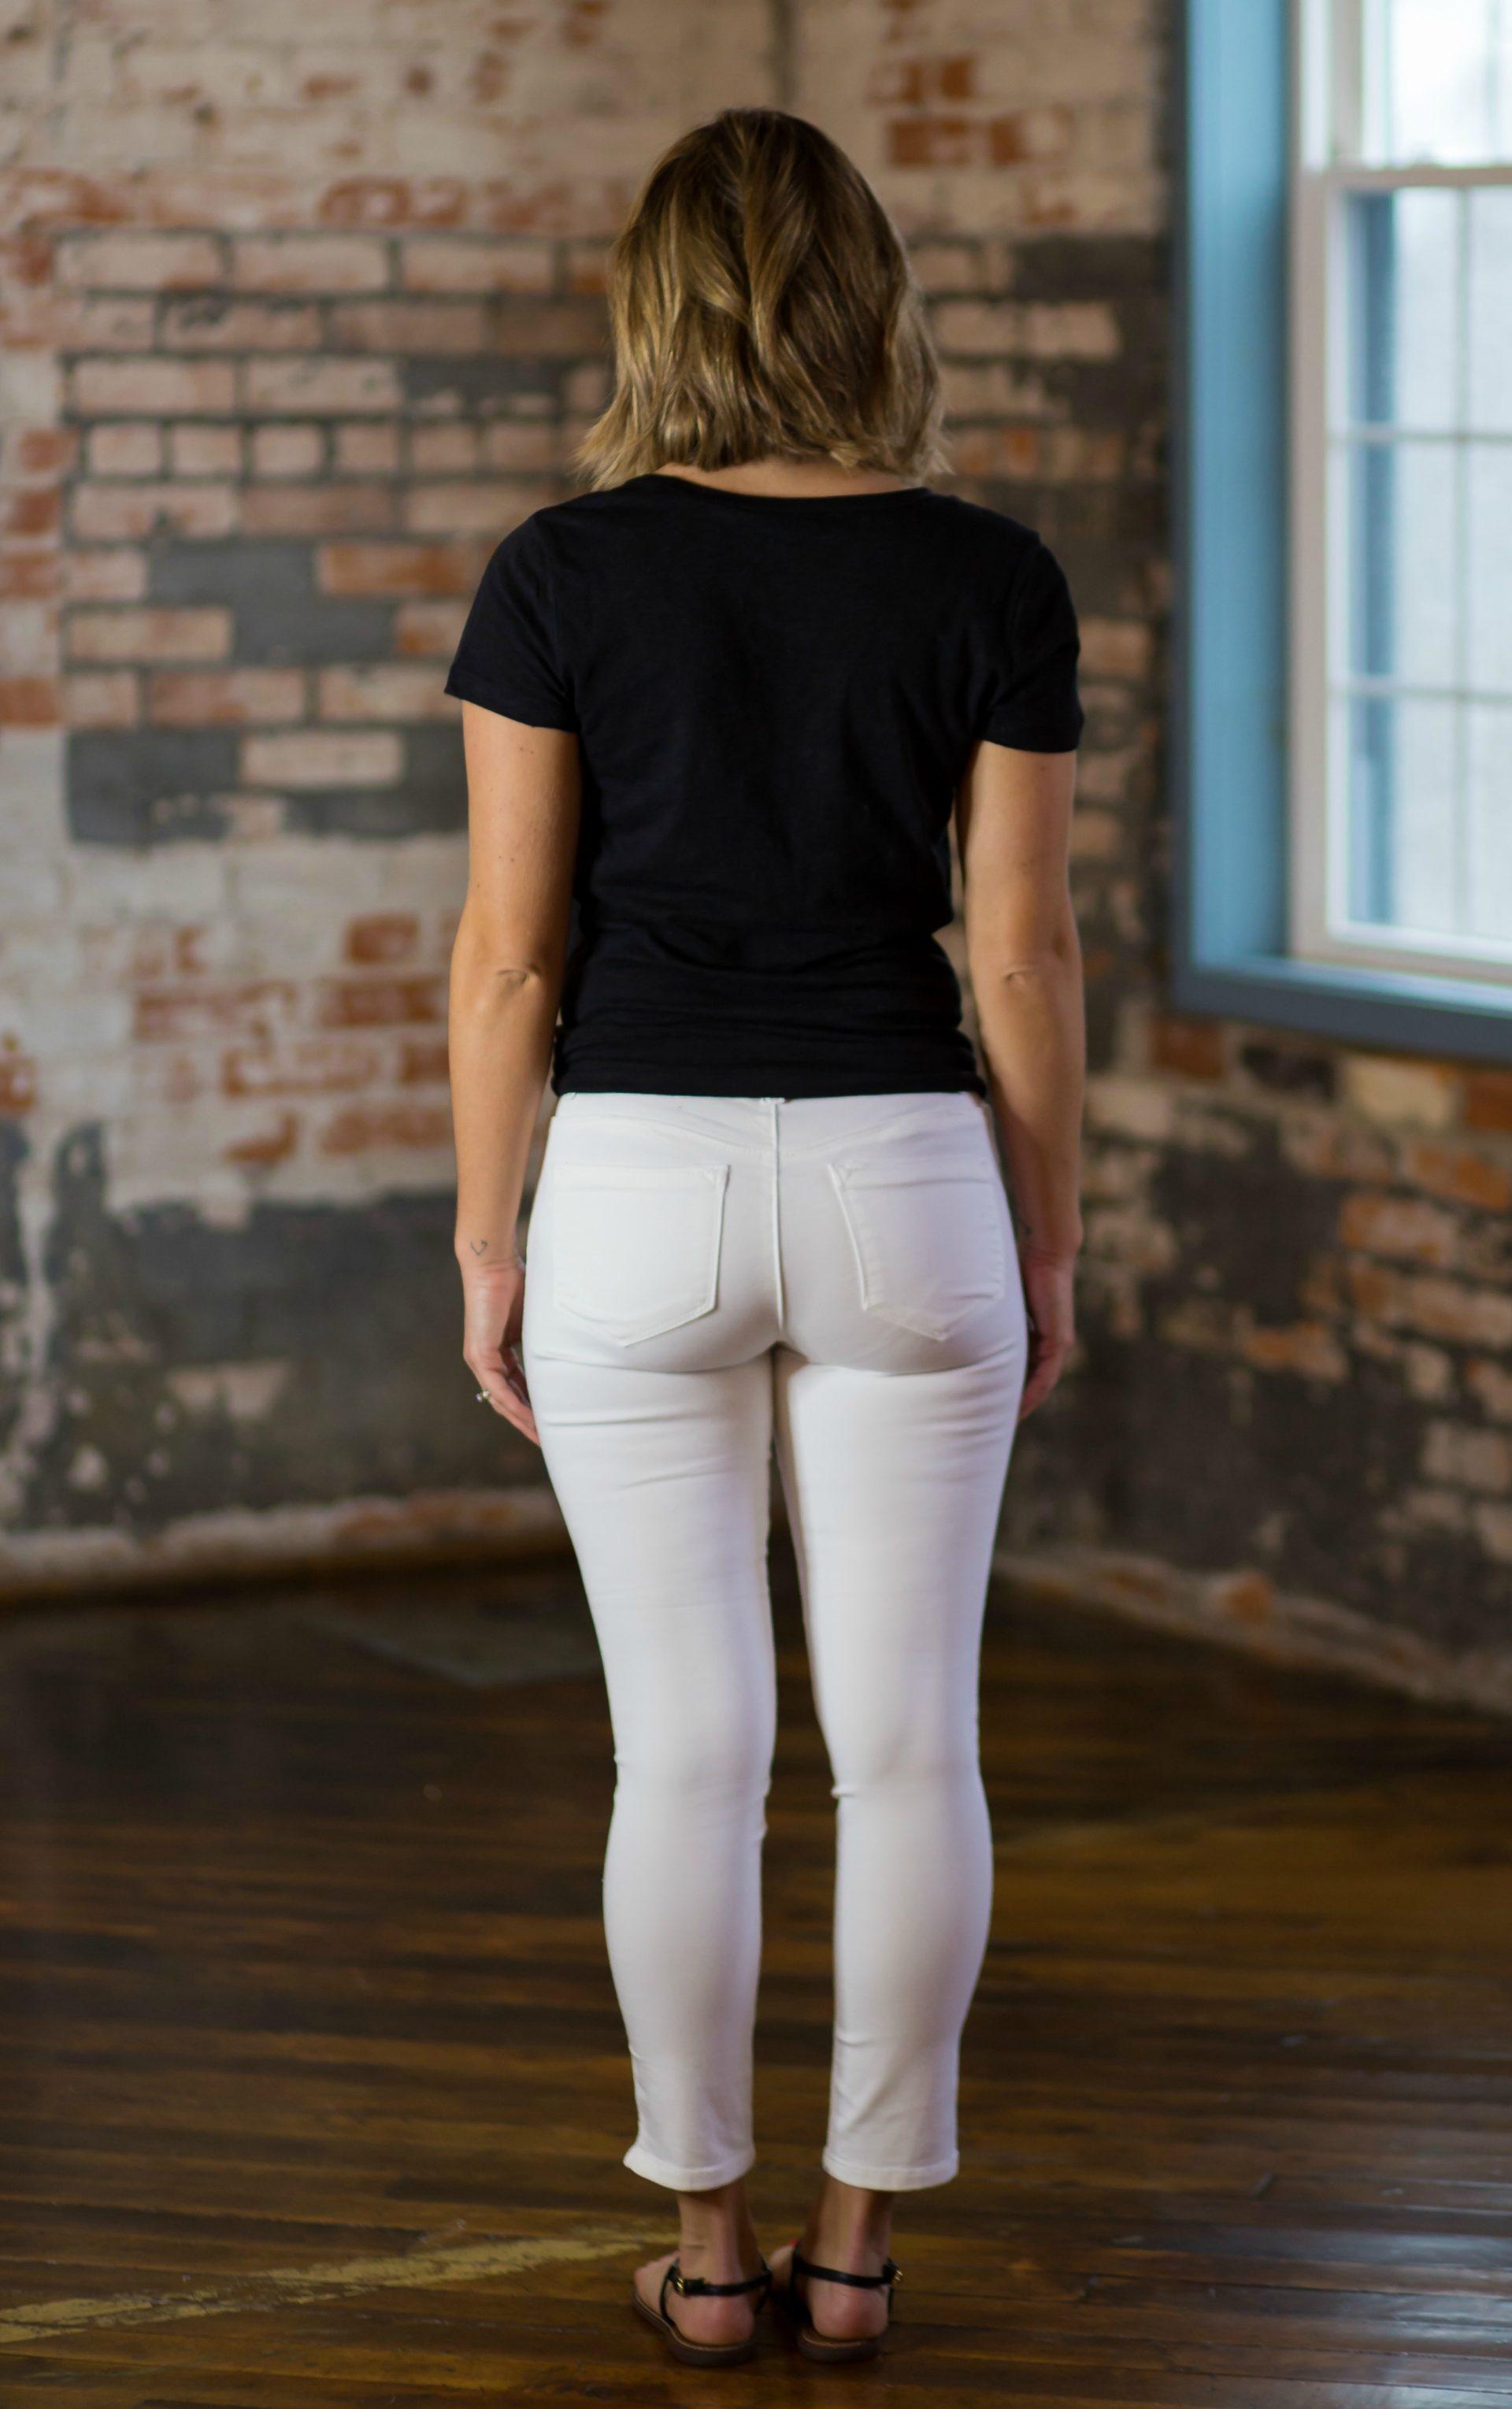 biggest-butt-on-a-white-girl-castration-fantasy